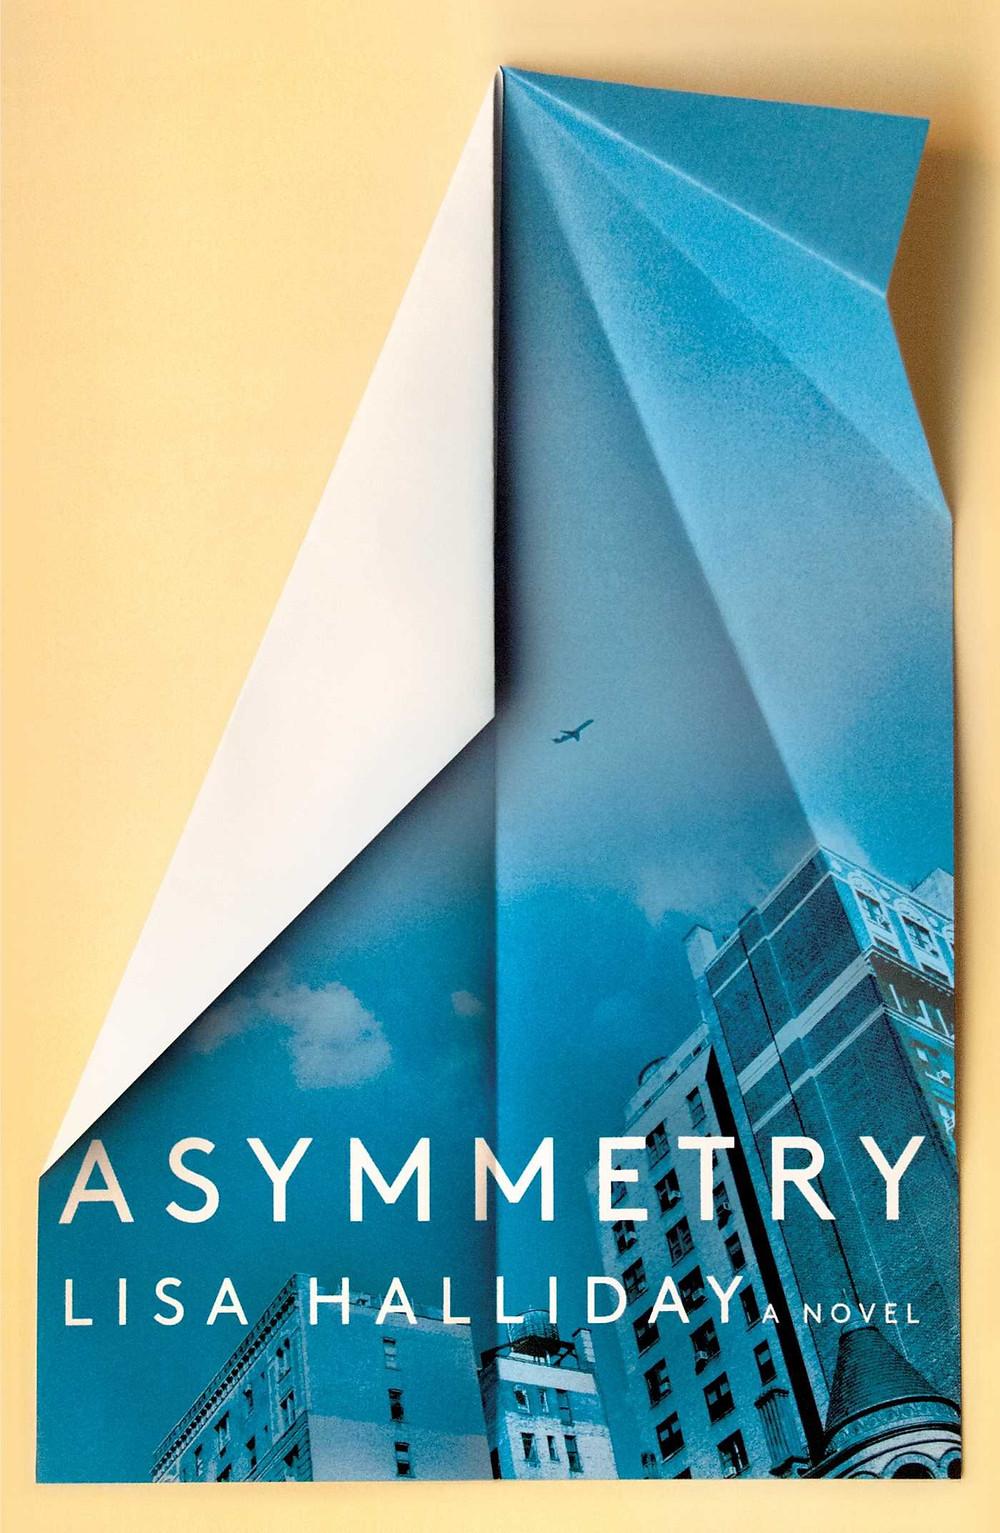 Asymmetry by Lisa Halliday : the book slut book reviews